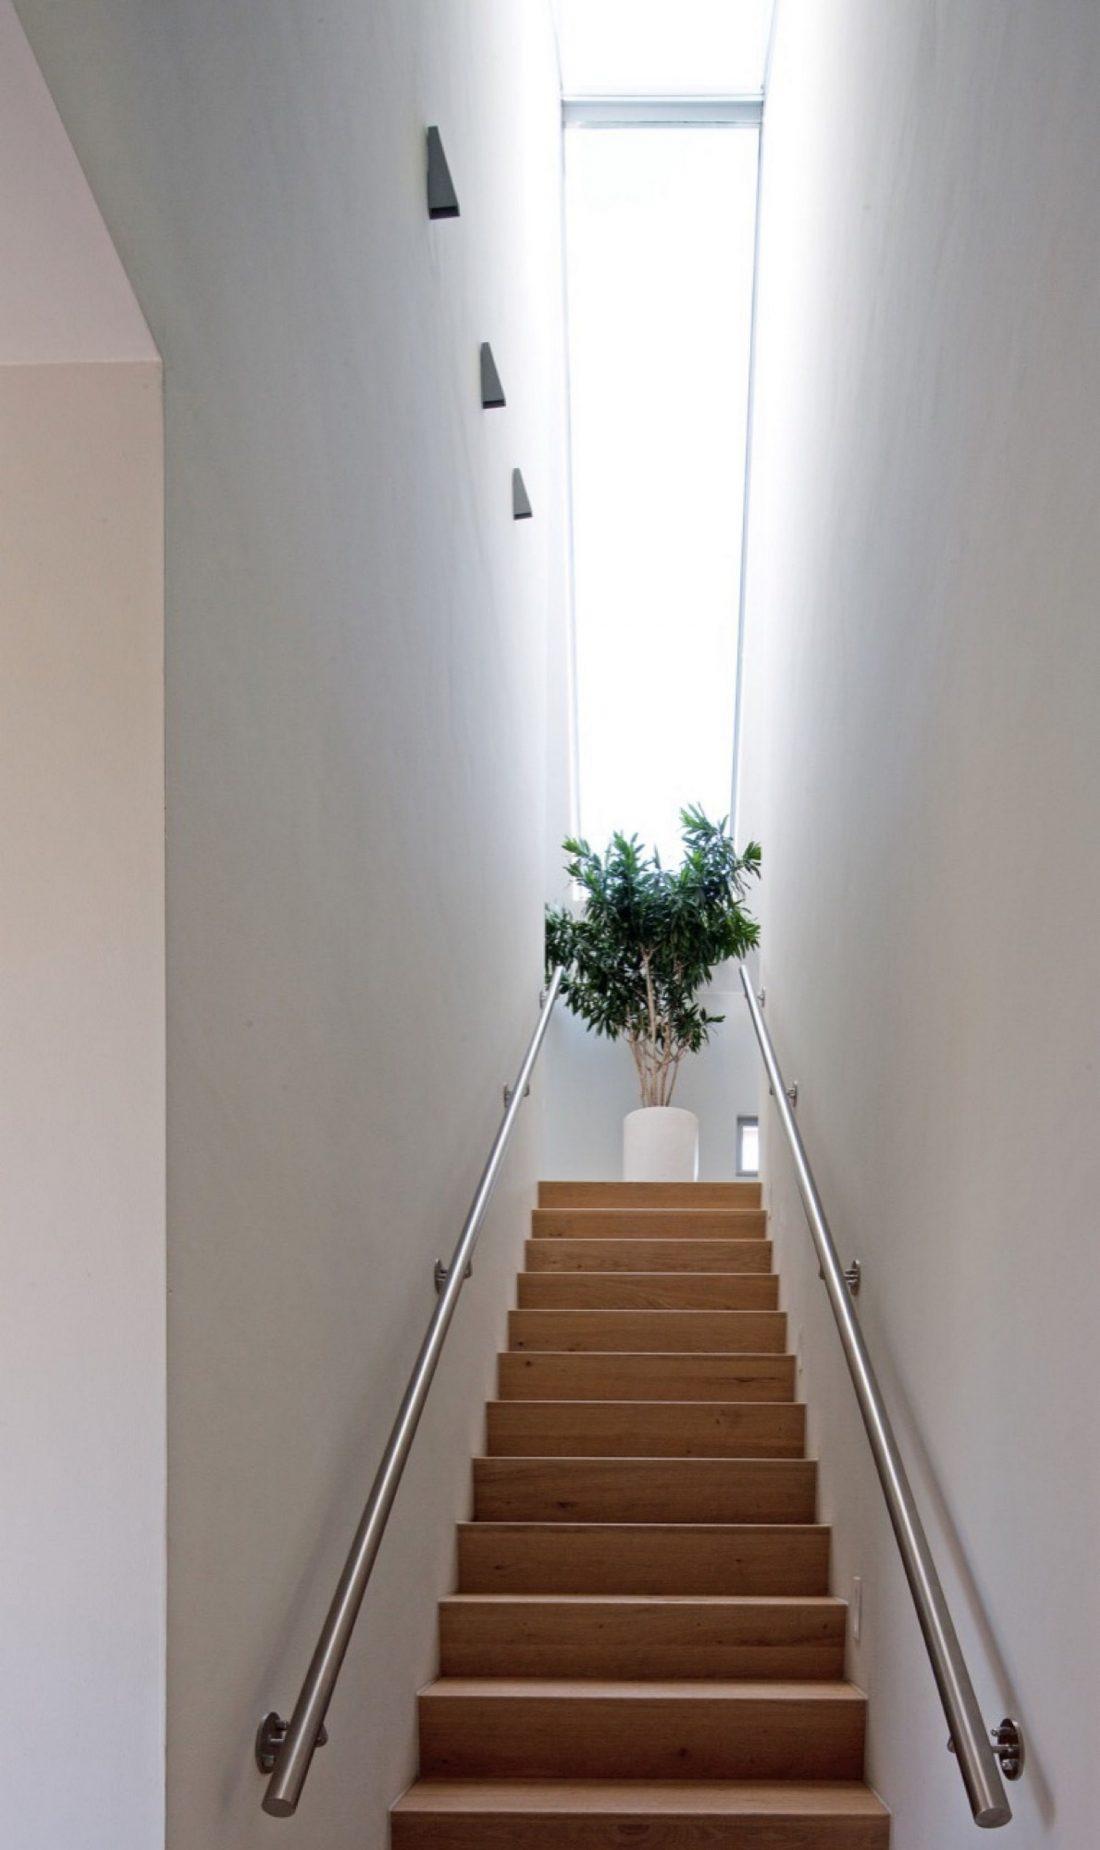 riel-estate-dom-v-niderlandah-po-proektu-studii-joris-verhoeven-5